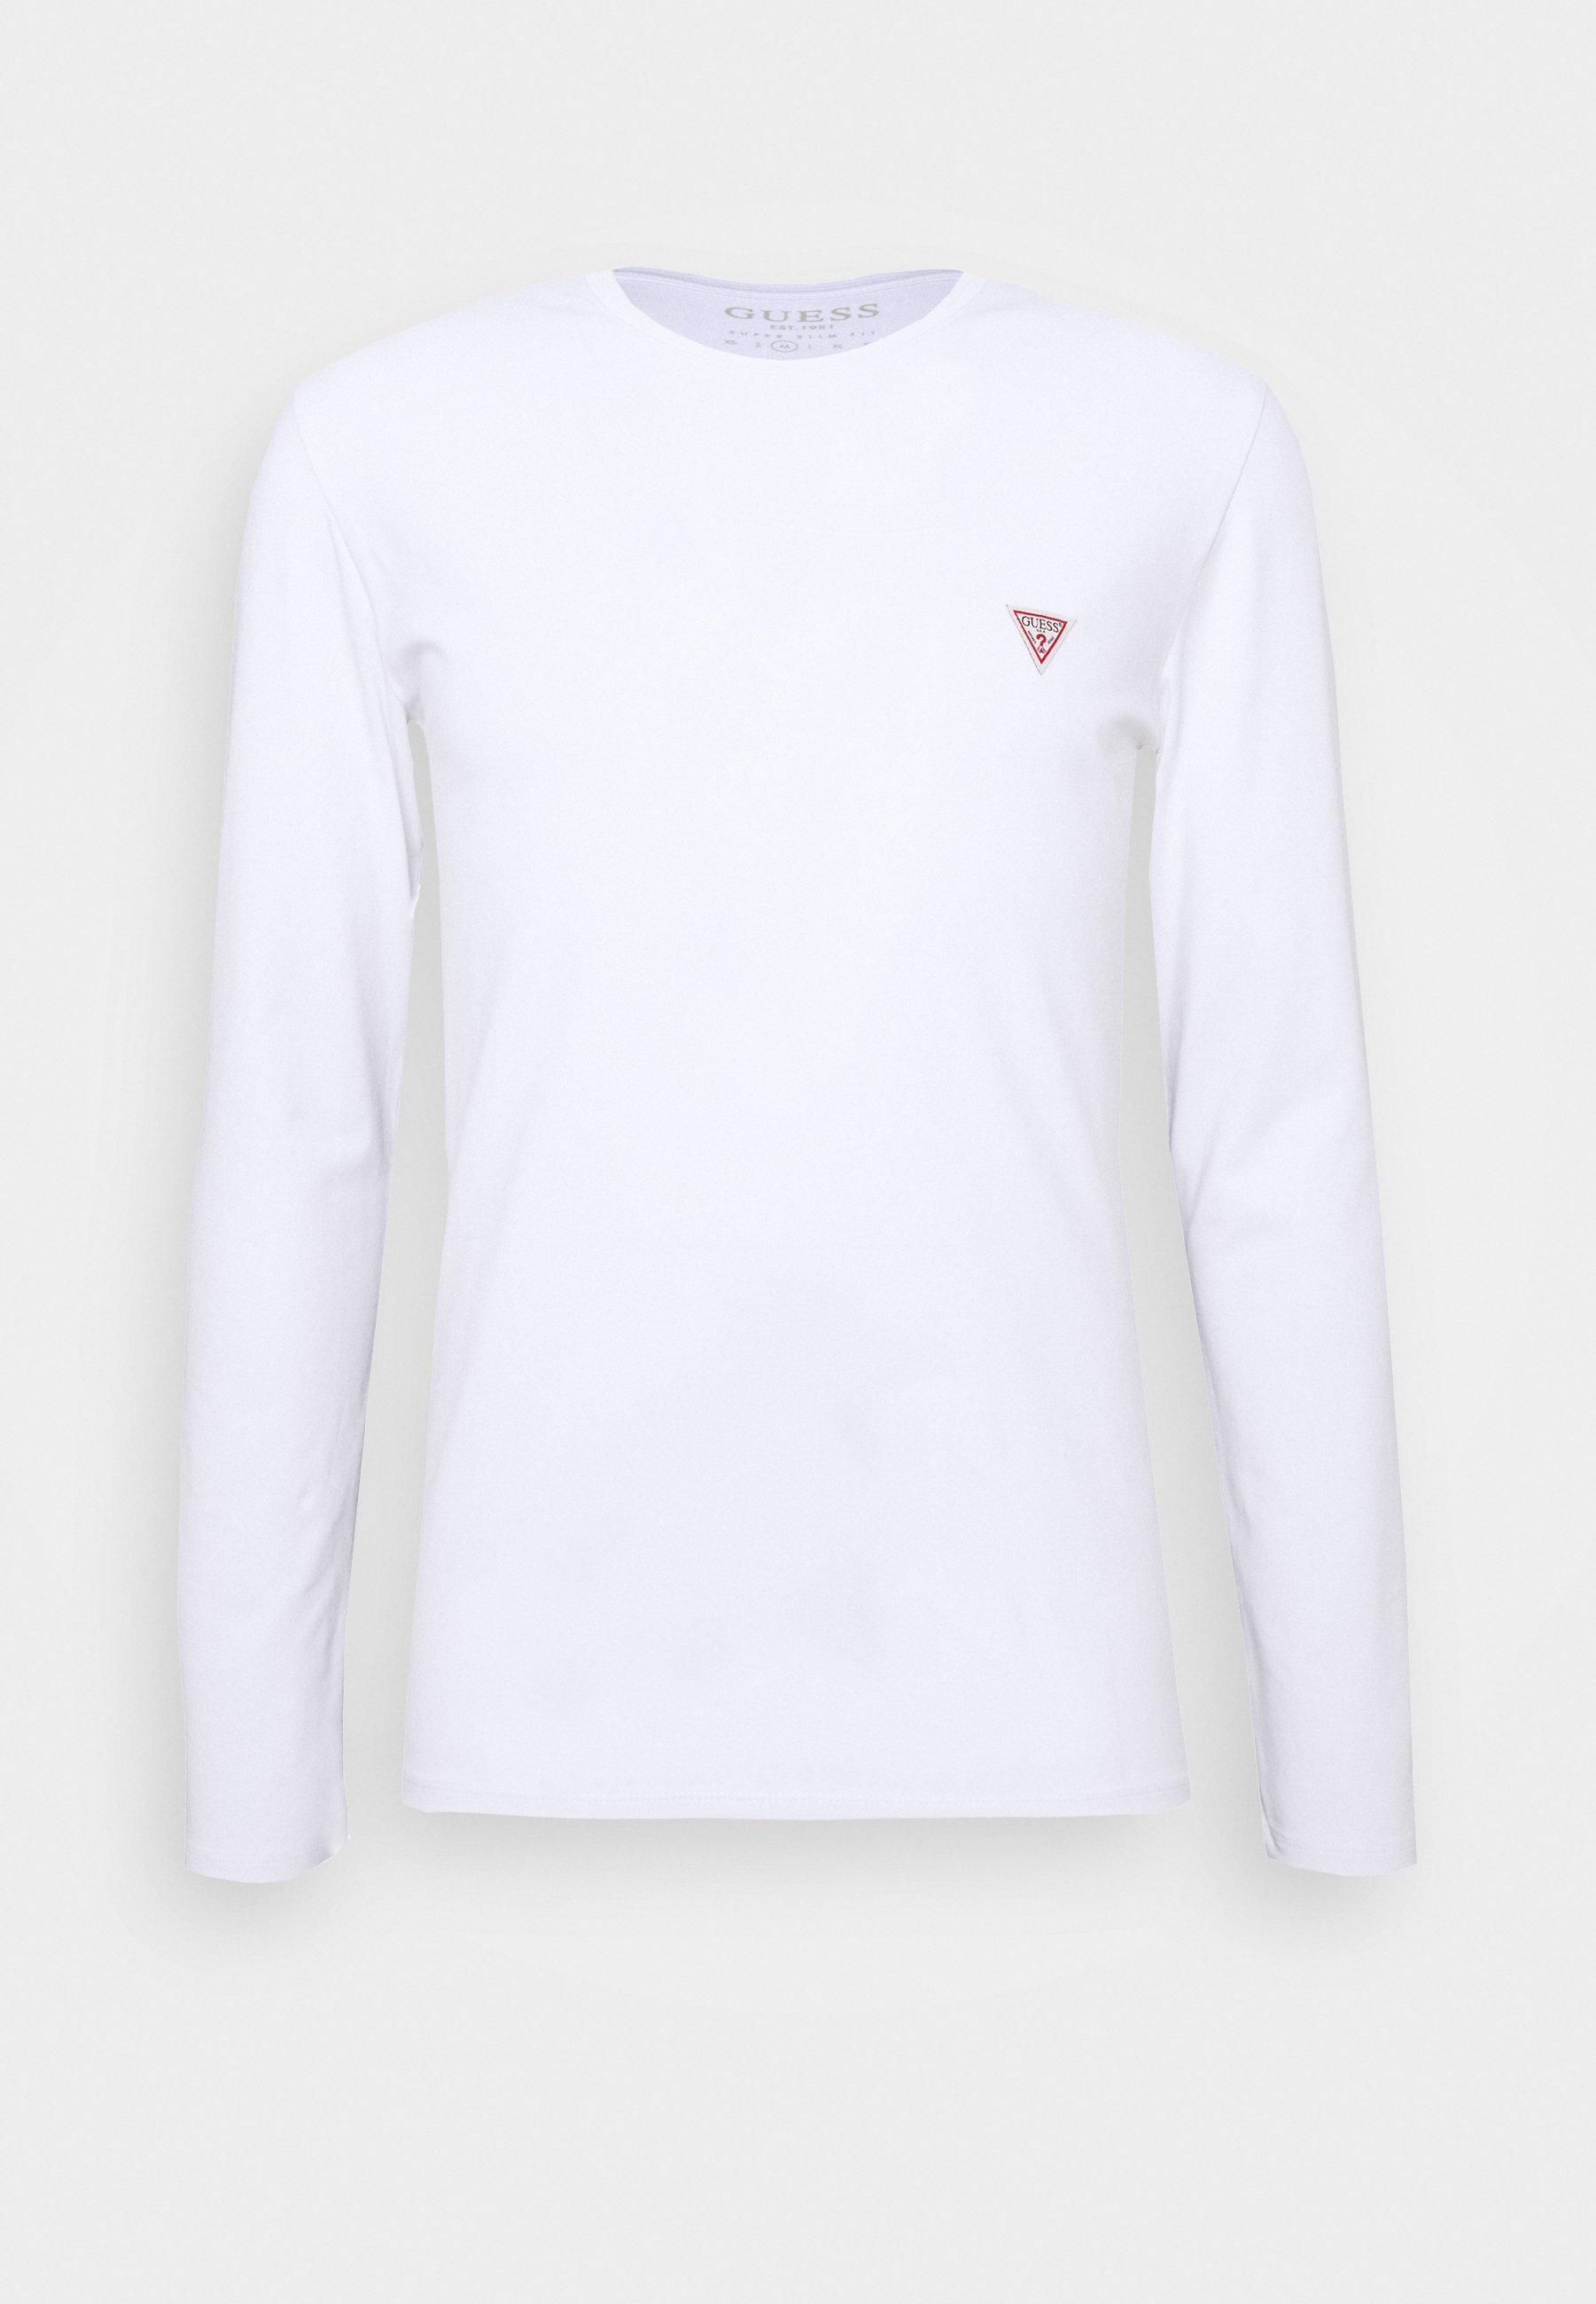 Guess X A$Ap Rocky Grey Striped T Shirt Medium